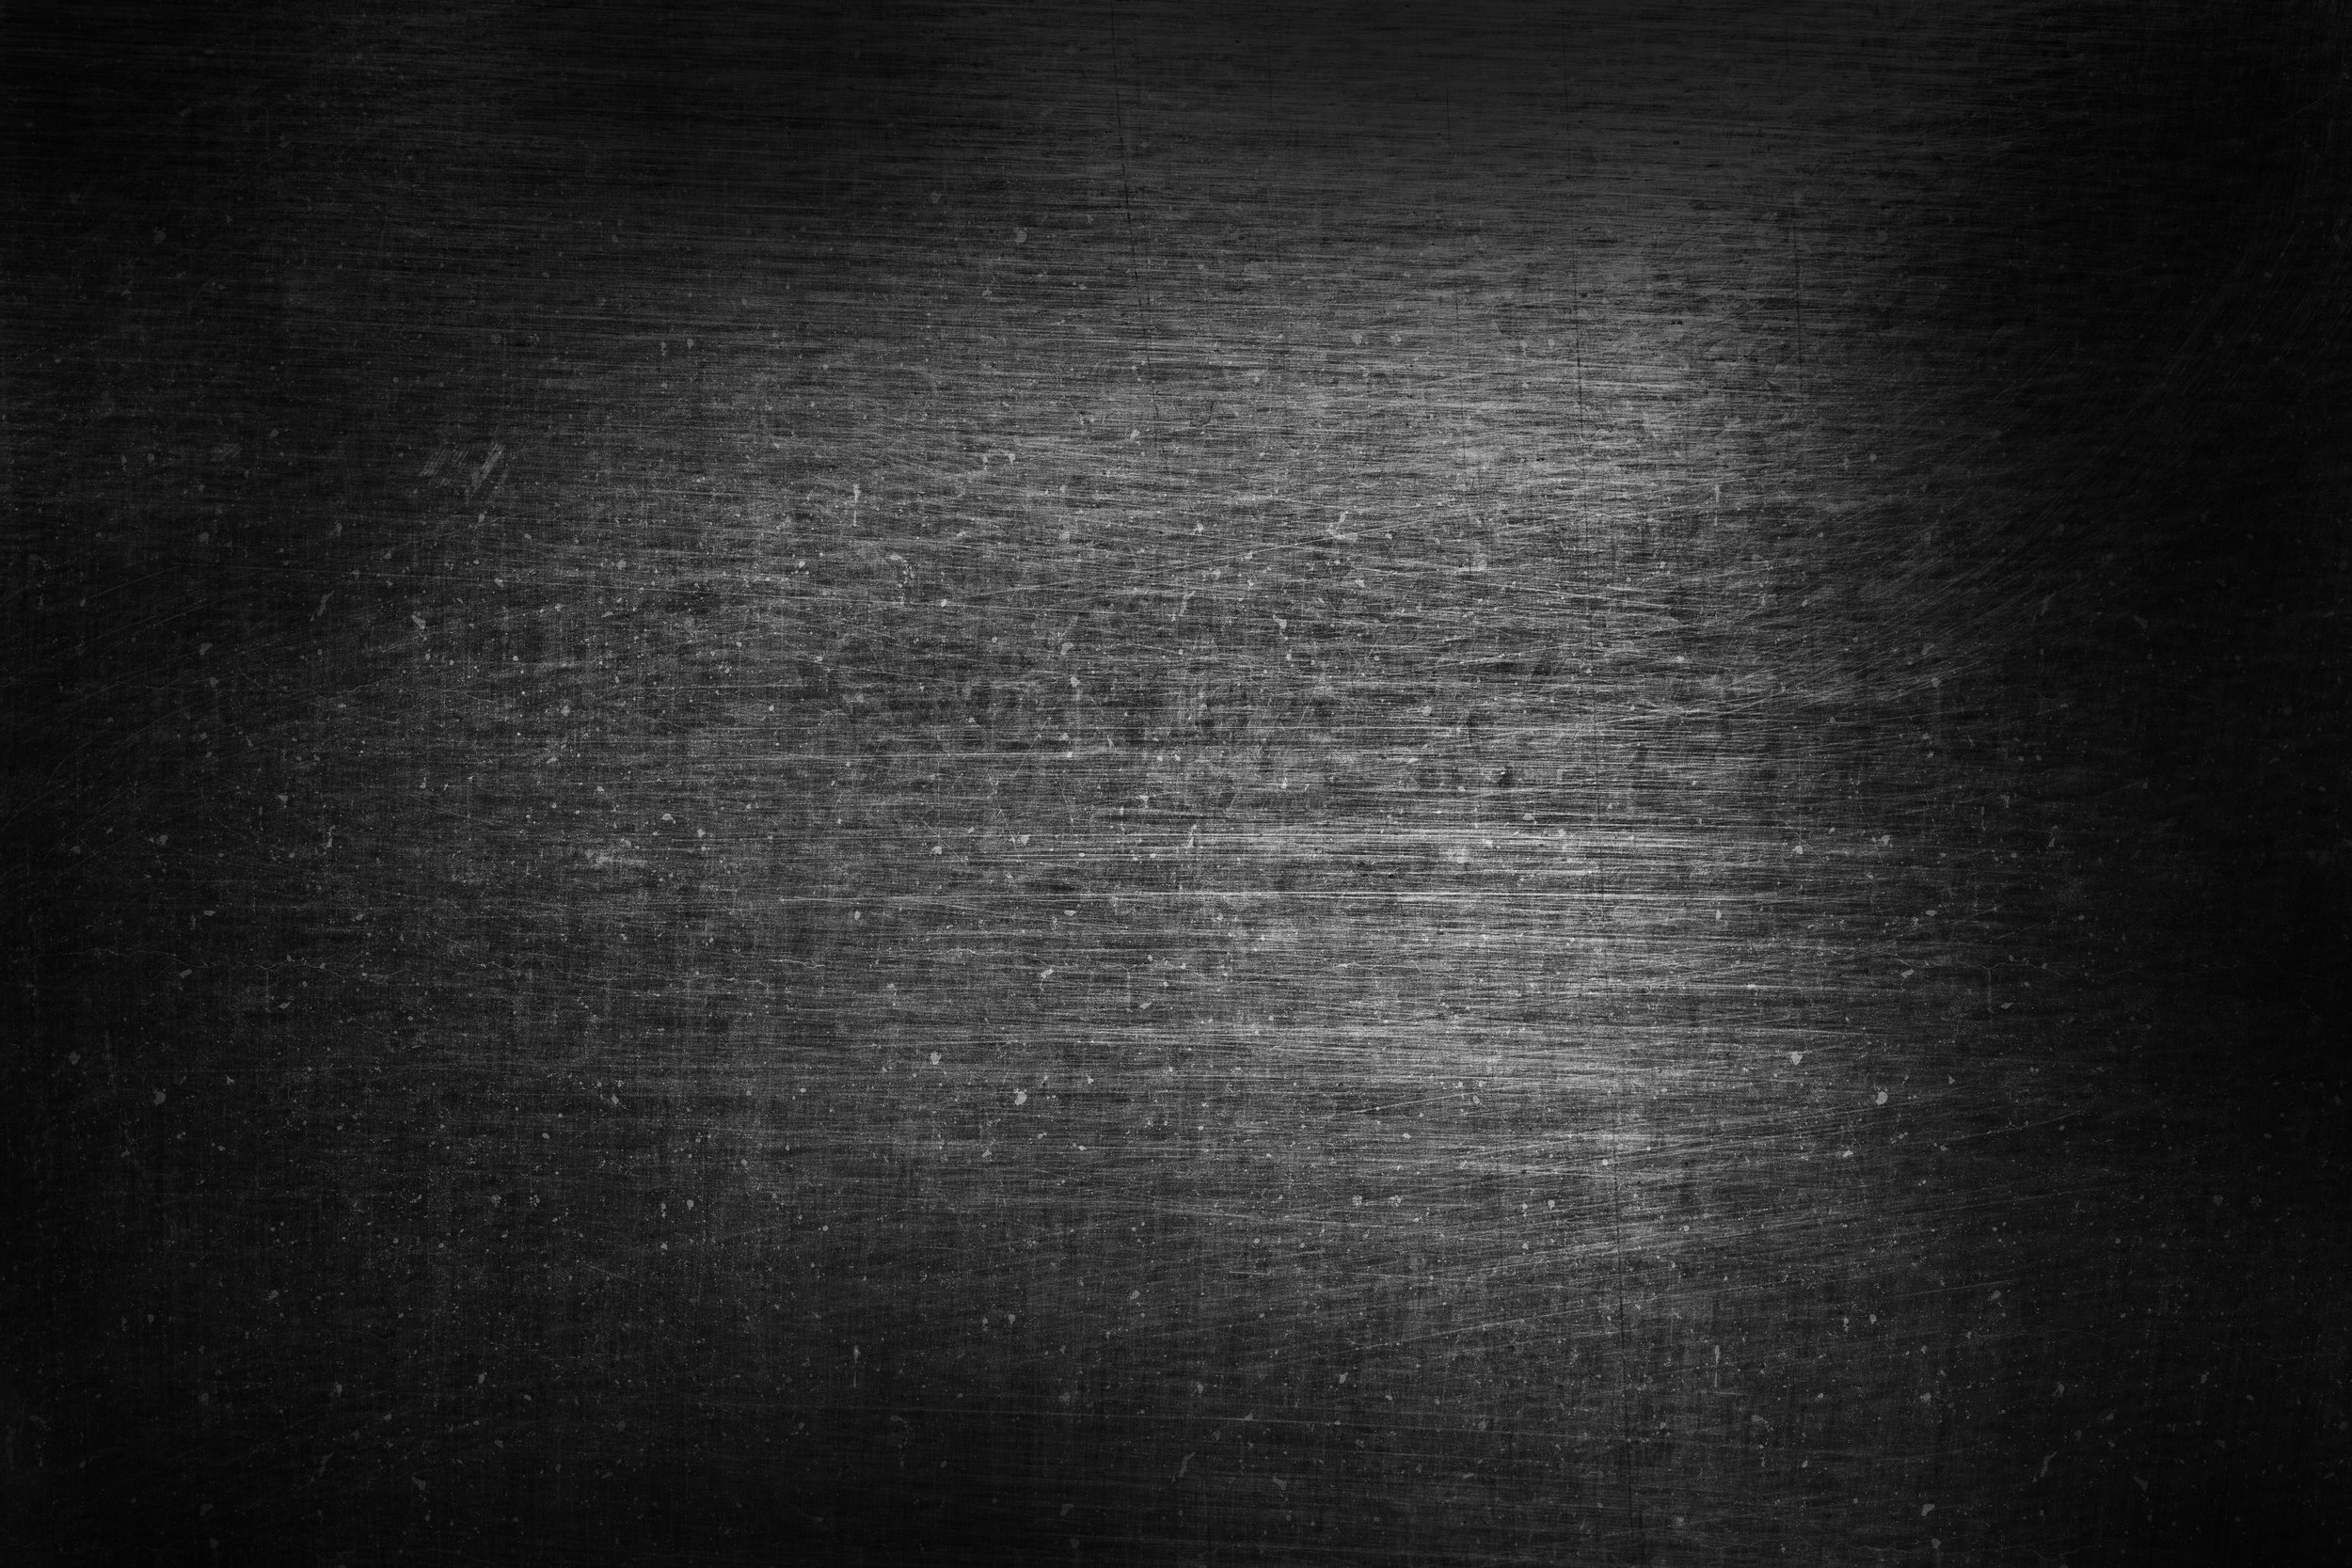 wildtextures-black-scratched-plate.jpg